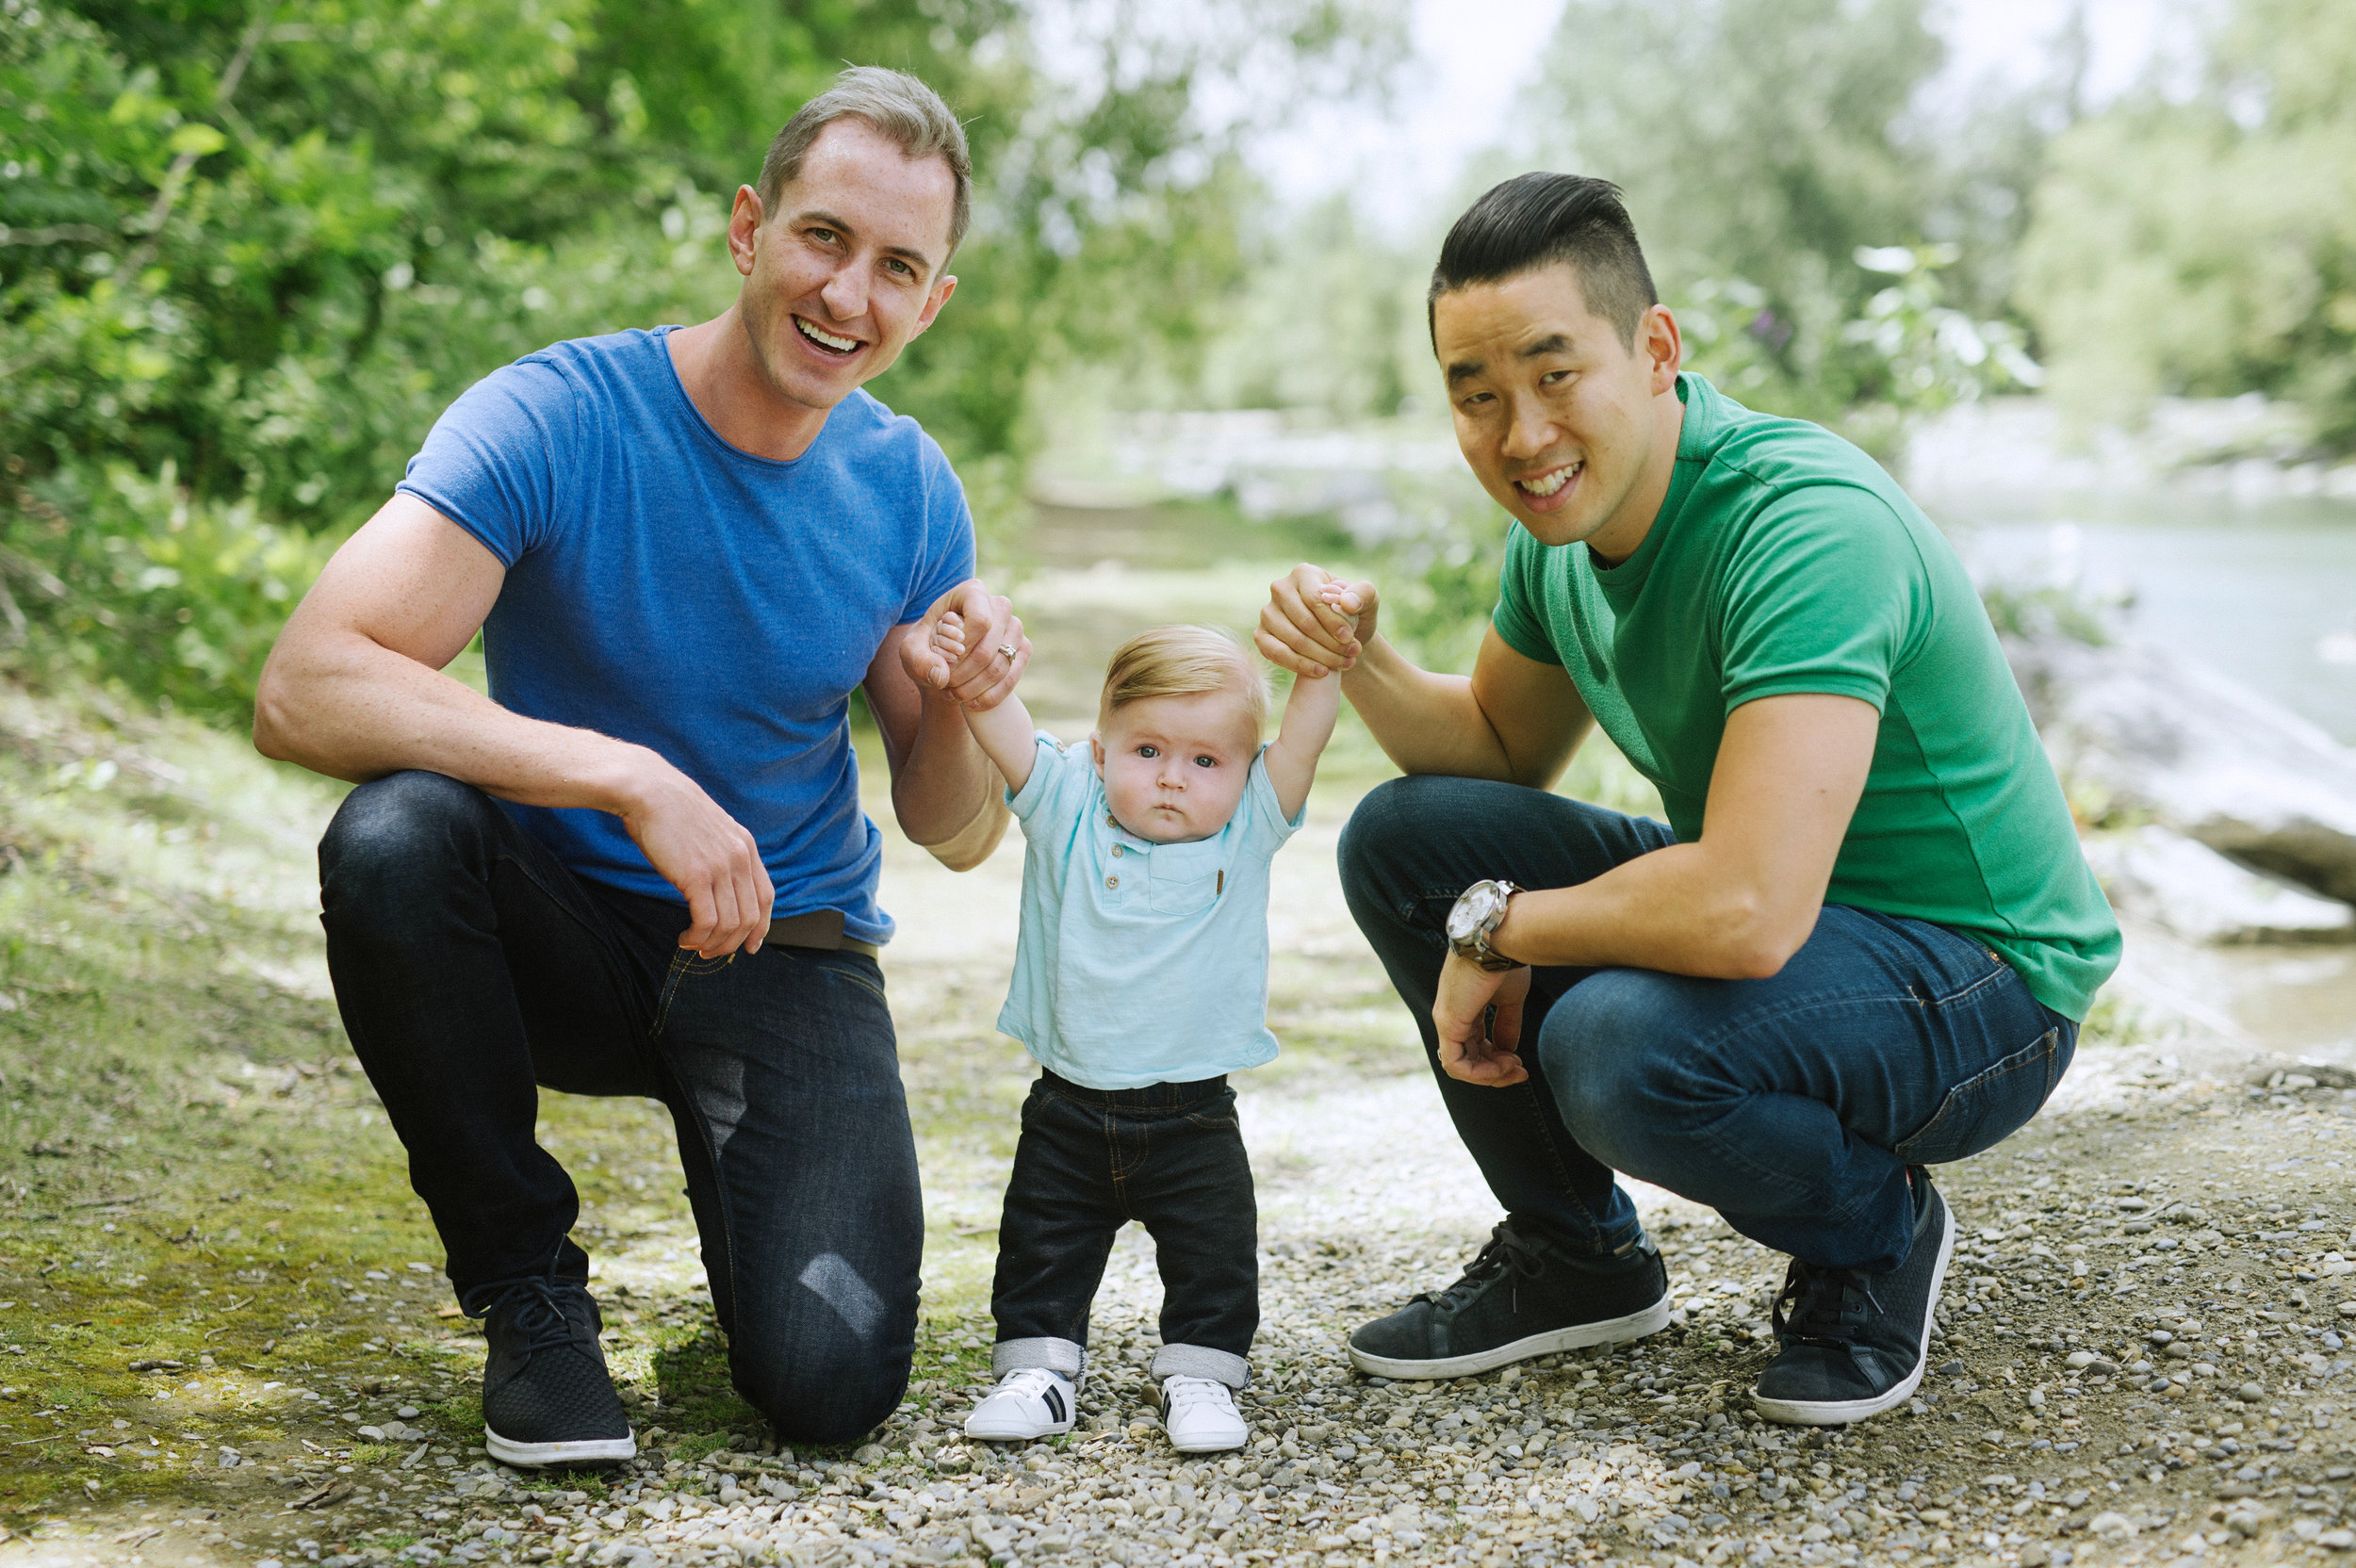 Calgary_Family_Photography_Adam_Jarom_Family_Portraits_2018_HR068.jpg